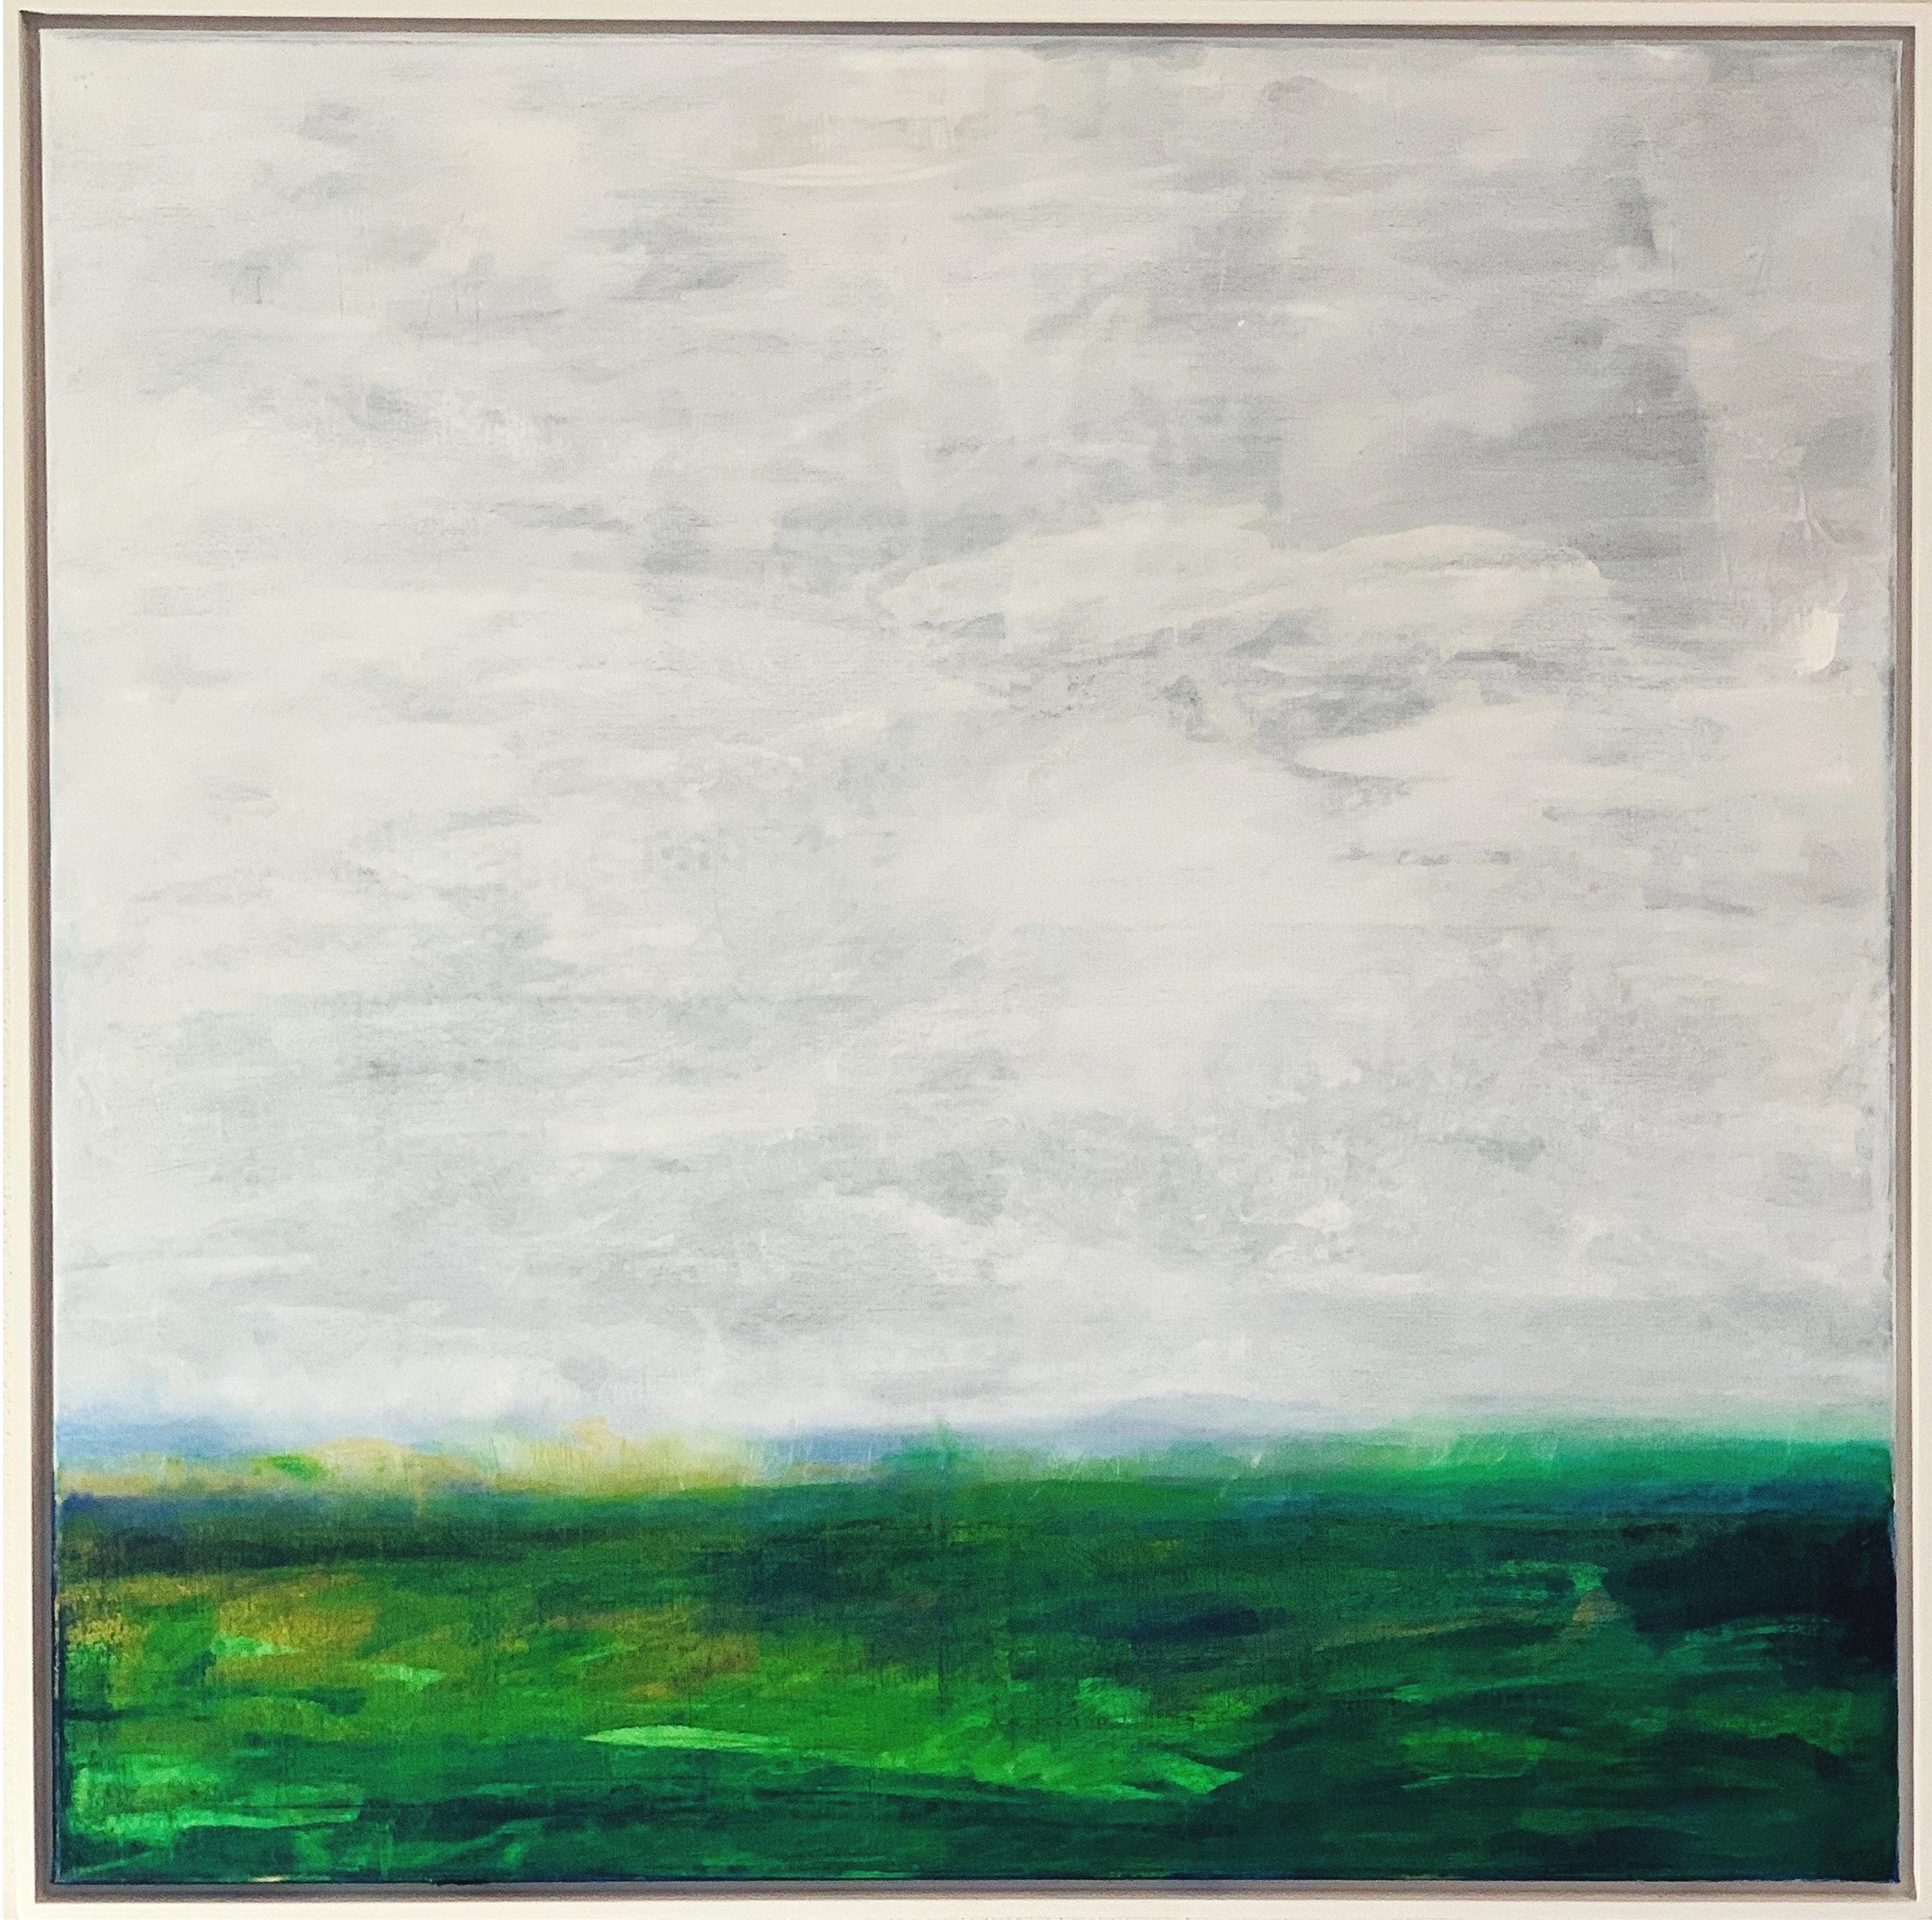 WOODLANDS Oils on canvas. 100cm x 100cm 🔴